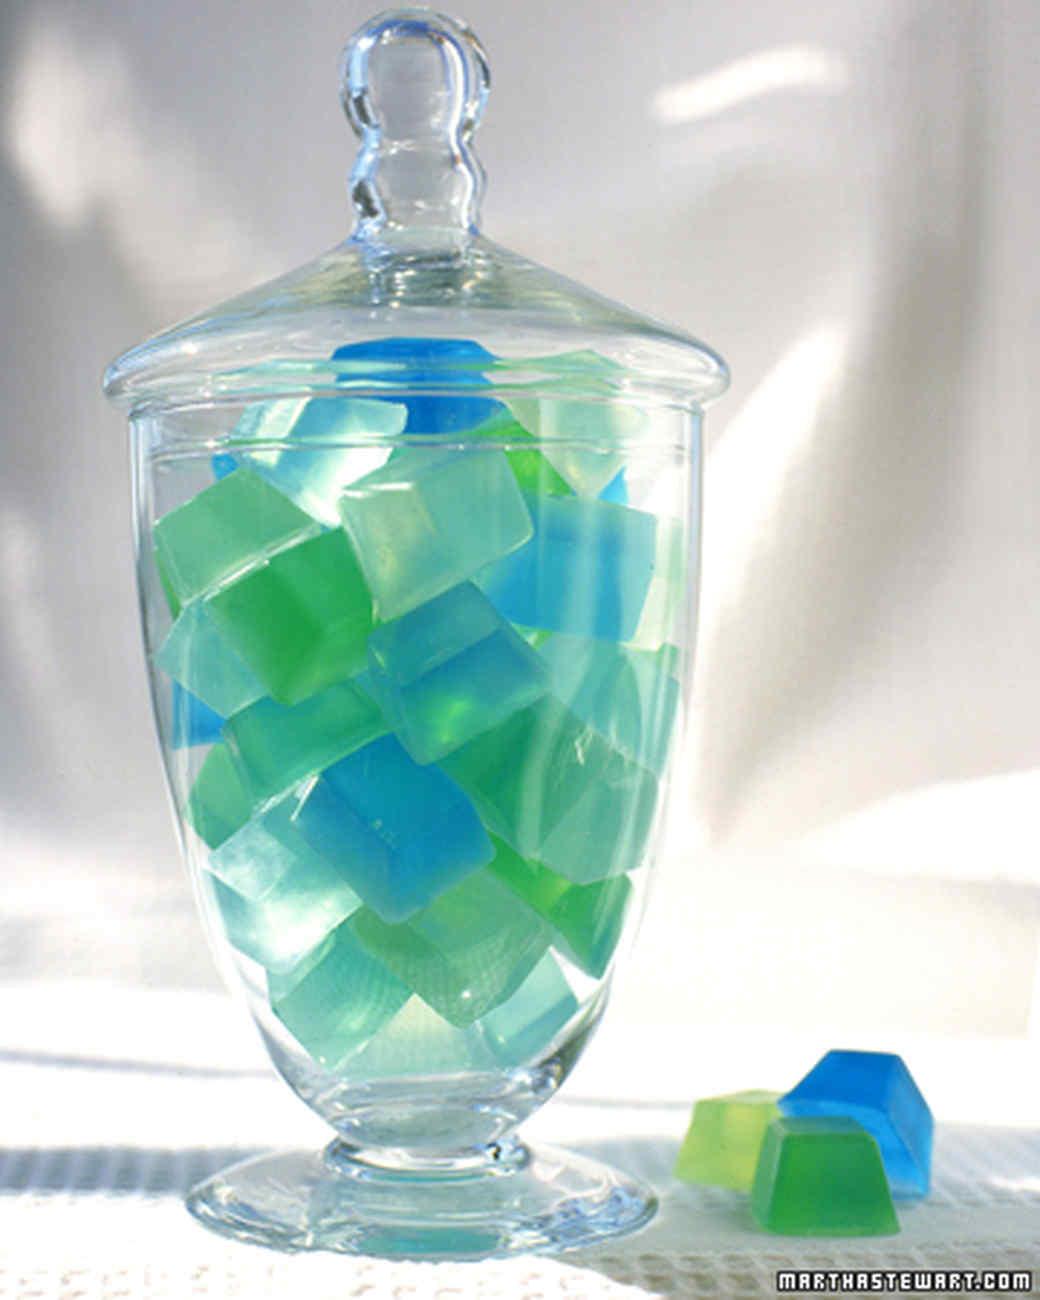 gt070_soapcubes2.jpg